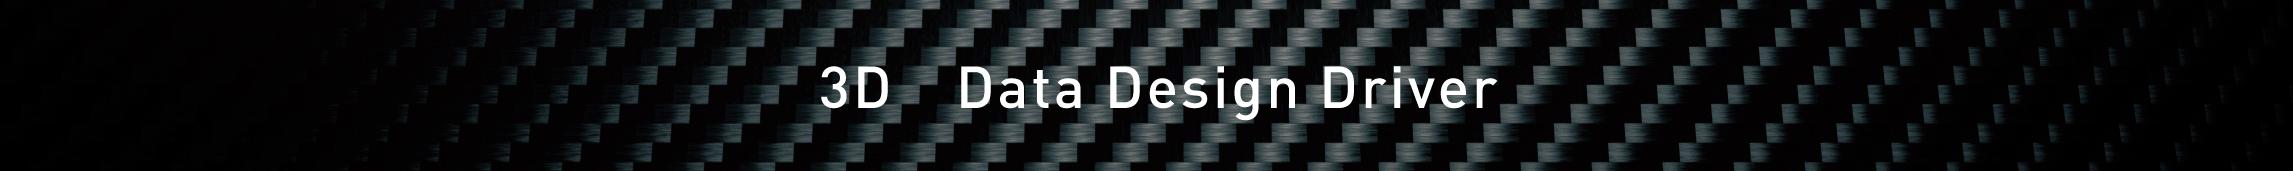 3D Data Design Driver